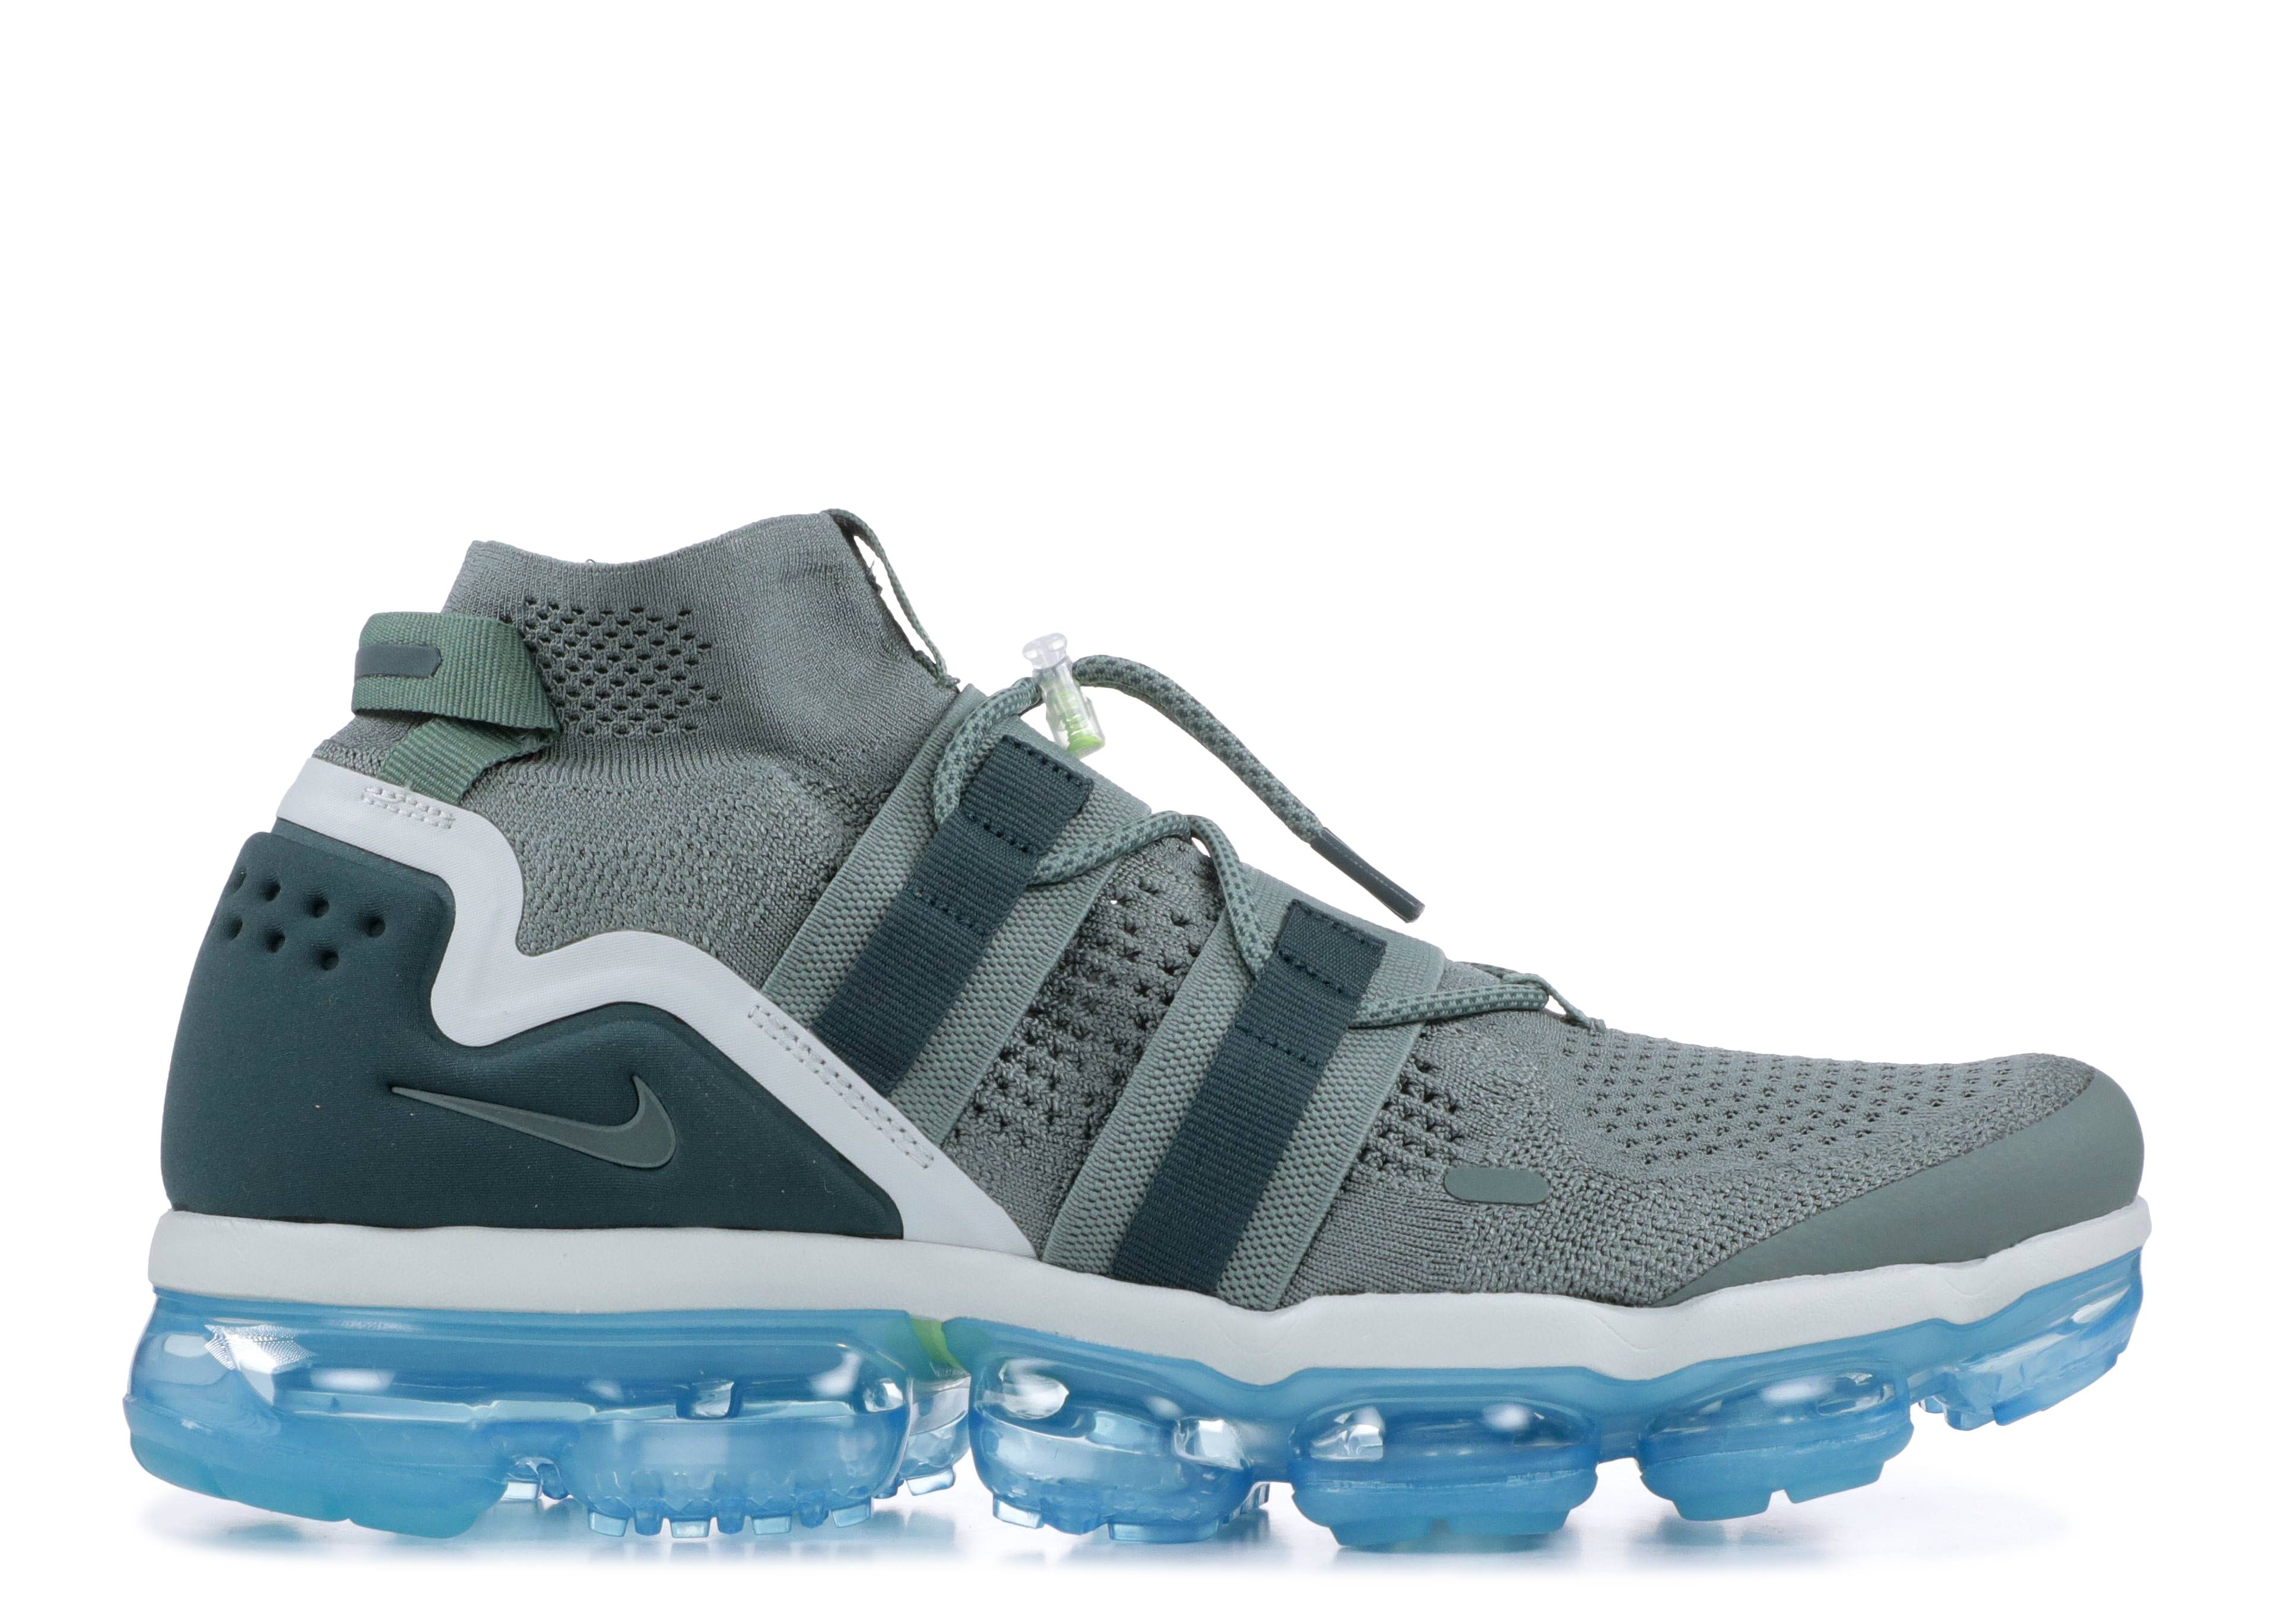 Nike Air Vapormax Fk utility